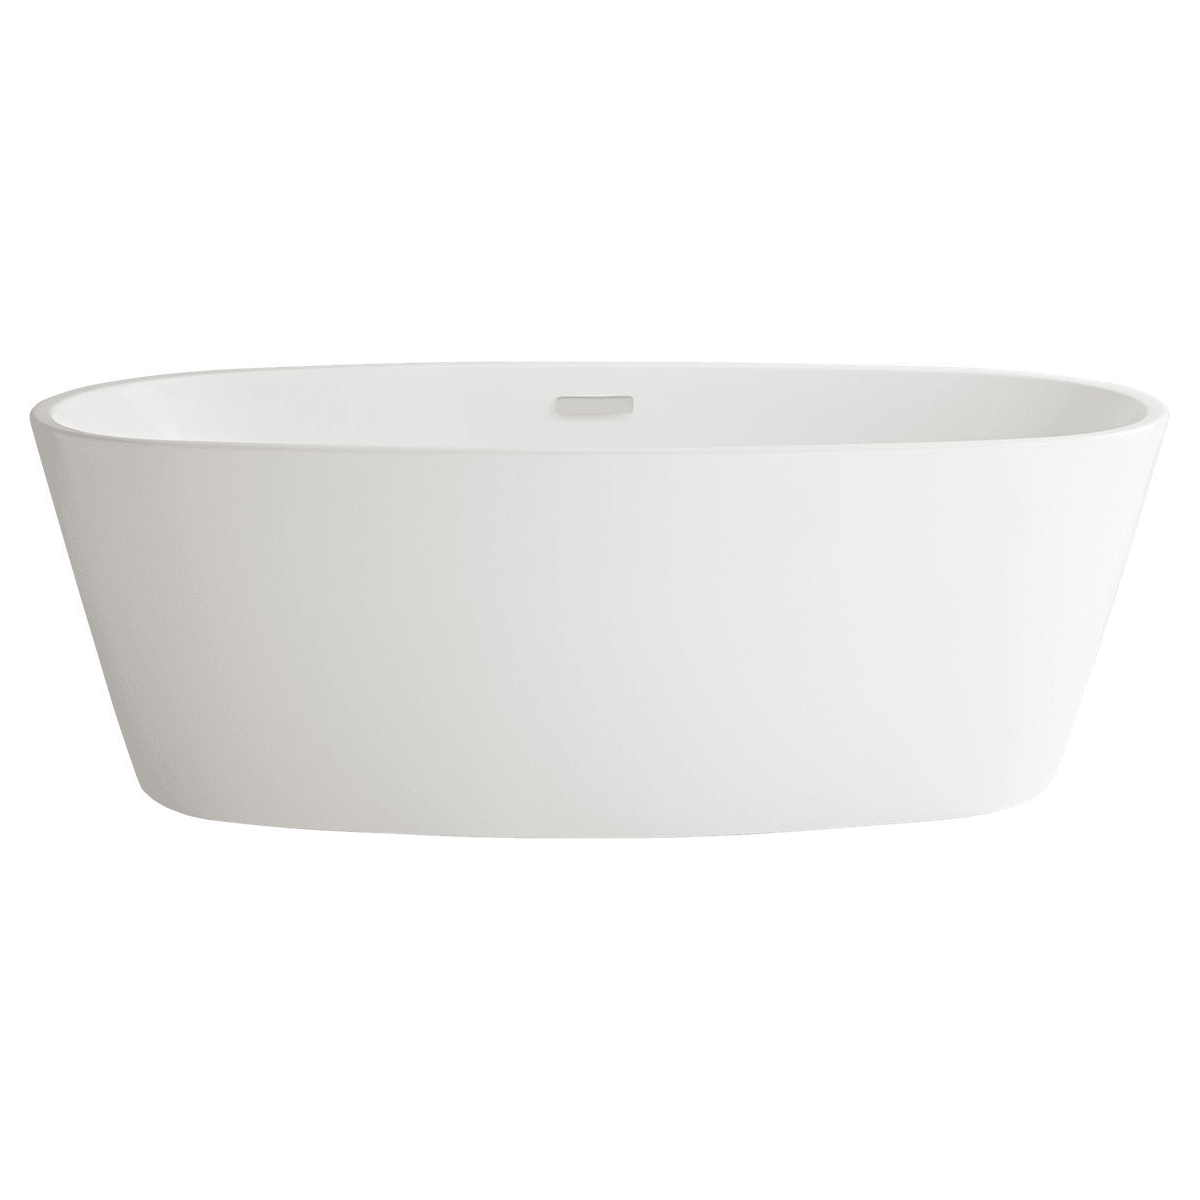 American Standard 2765 034 020 White Coastal Serin 68 3 4 Acrylic Free Standing Soaking Bathtub With Center Drain Faucet Com